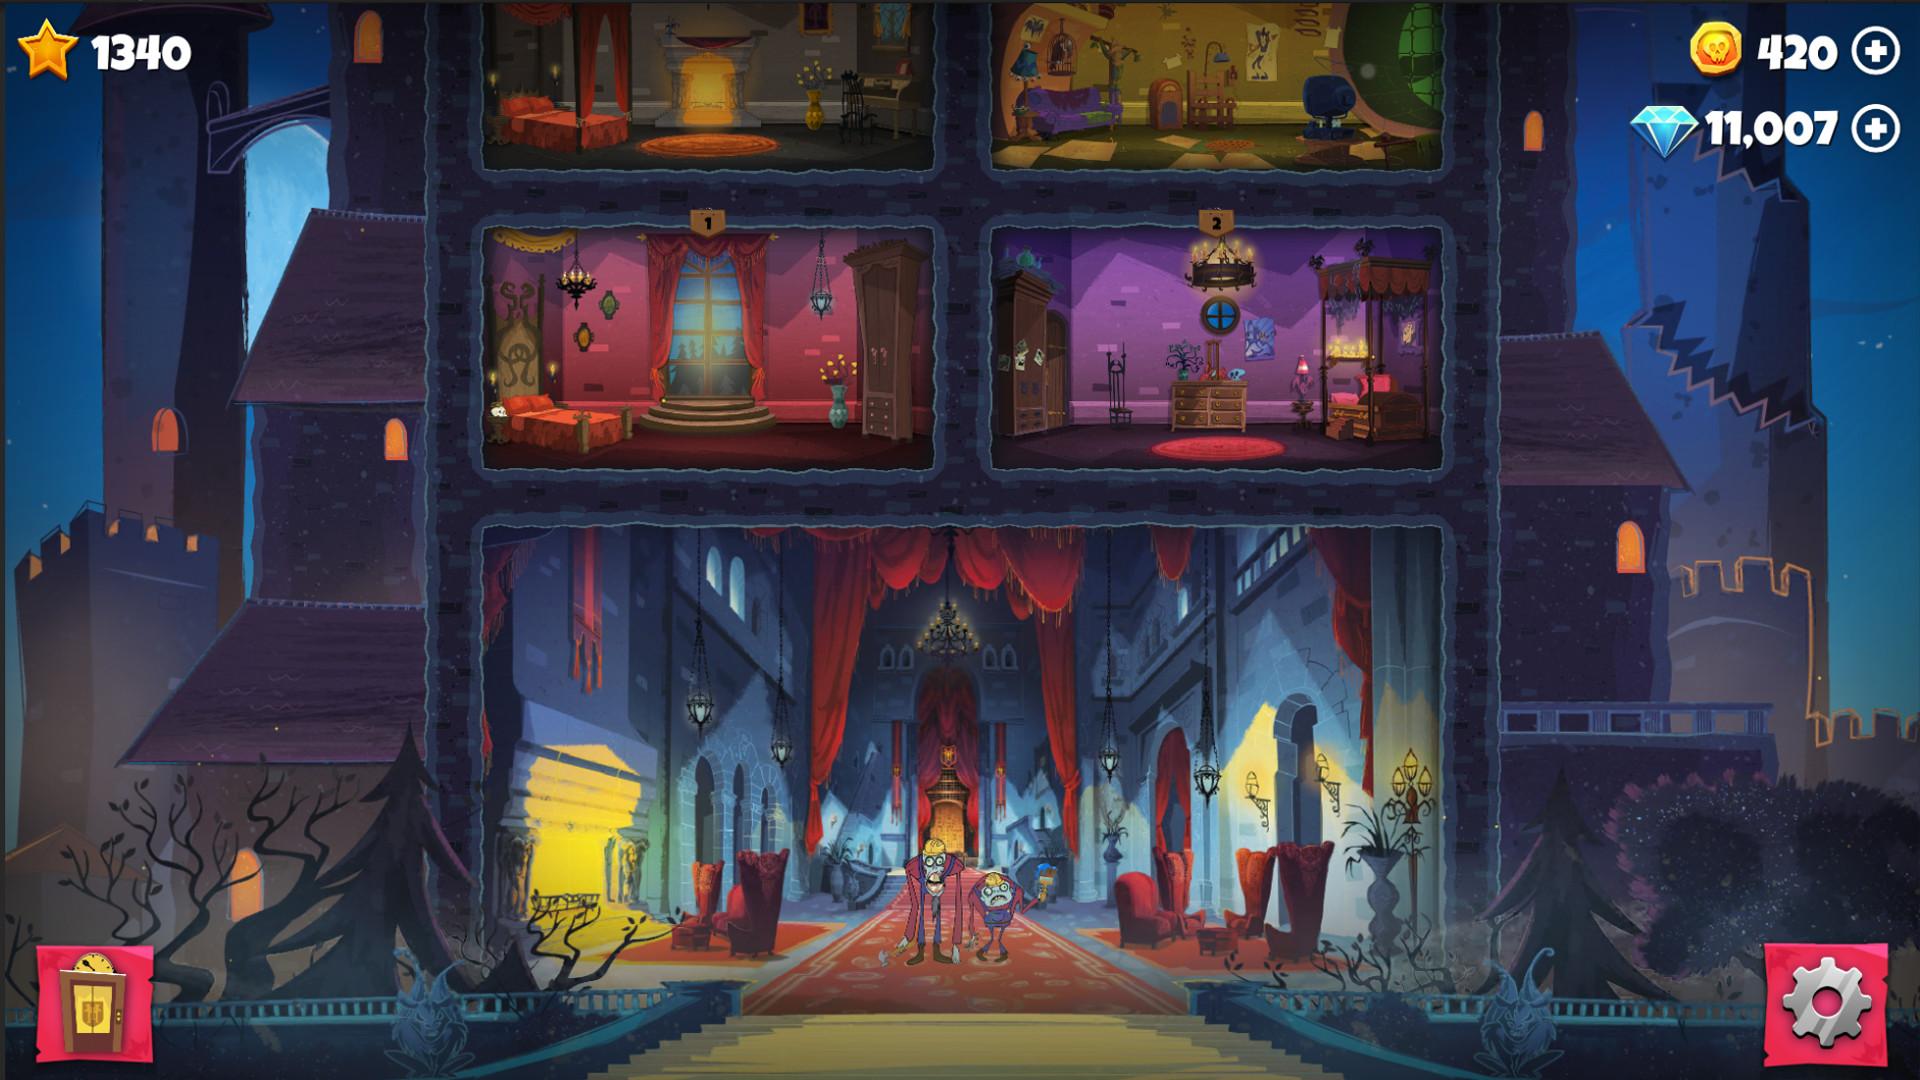 Lara bendoris hoteldecoration metagame